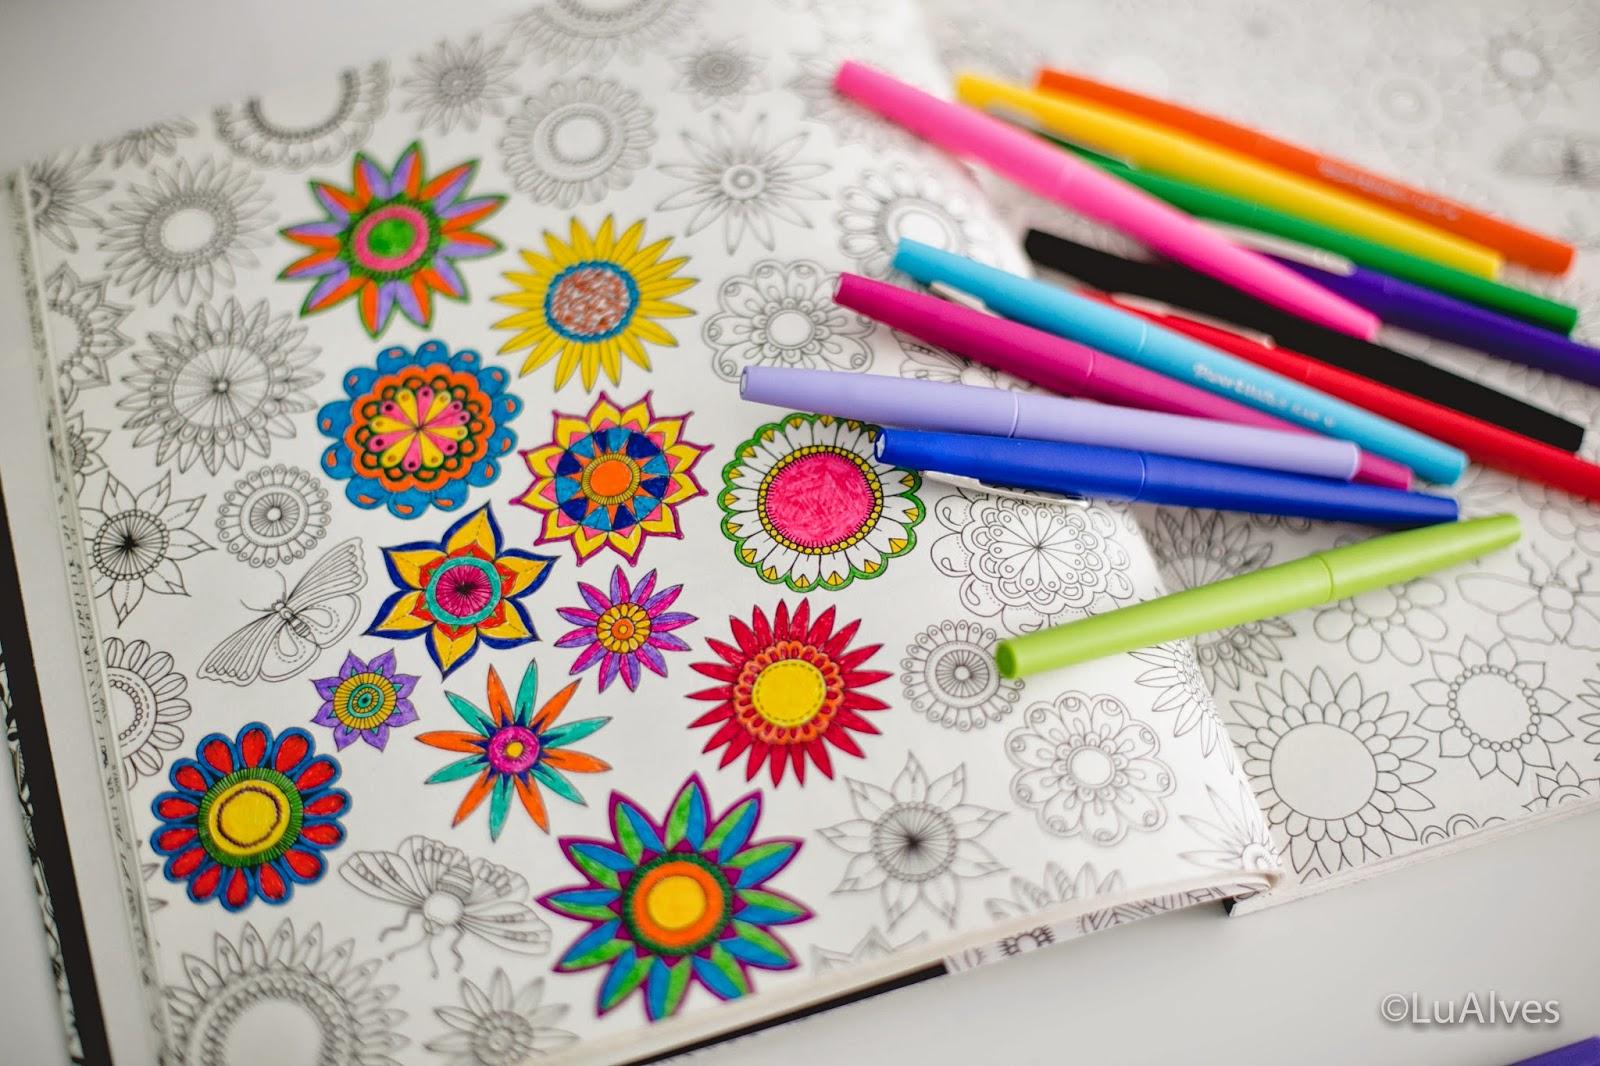 Arte Terapia Anti Stress Jardins 100 Imagens Para Colorir  - imagens para colorir de livros